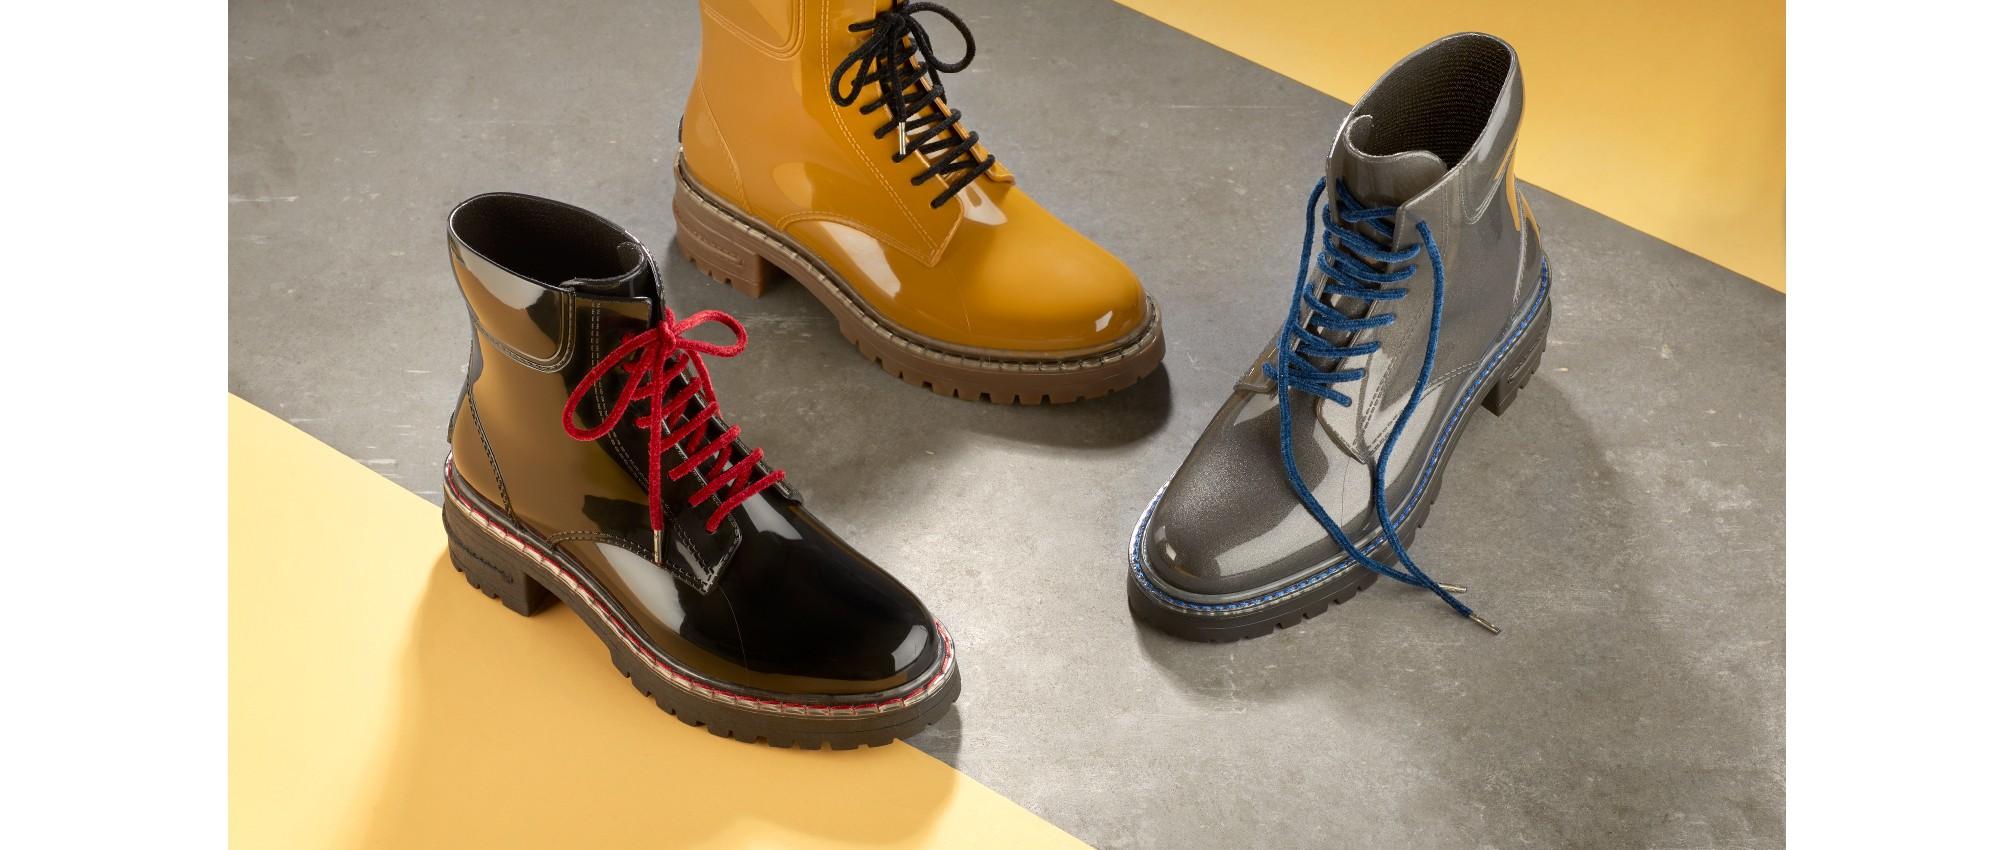 Woman militar boots